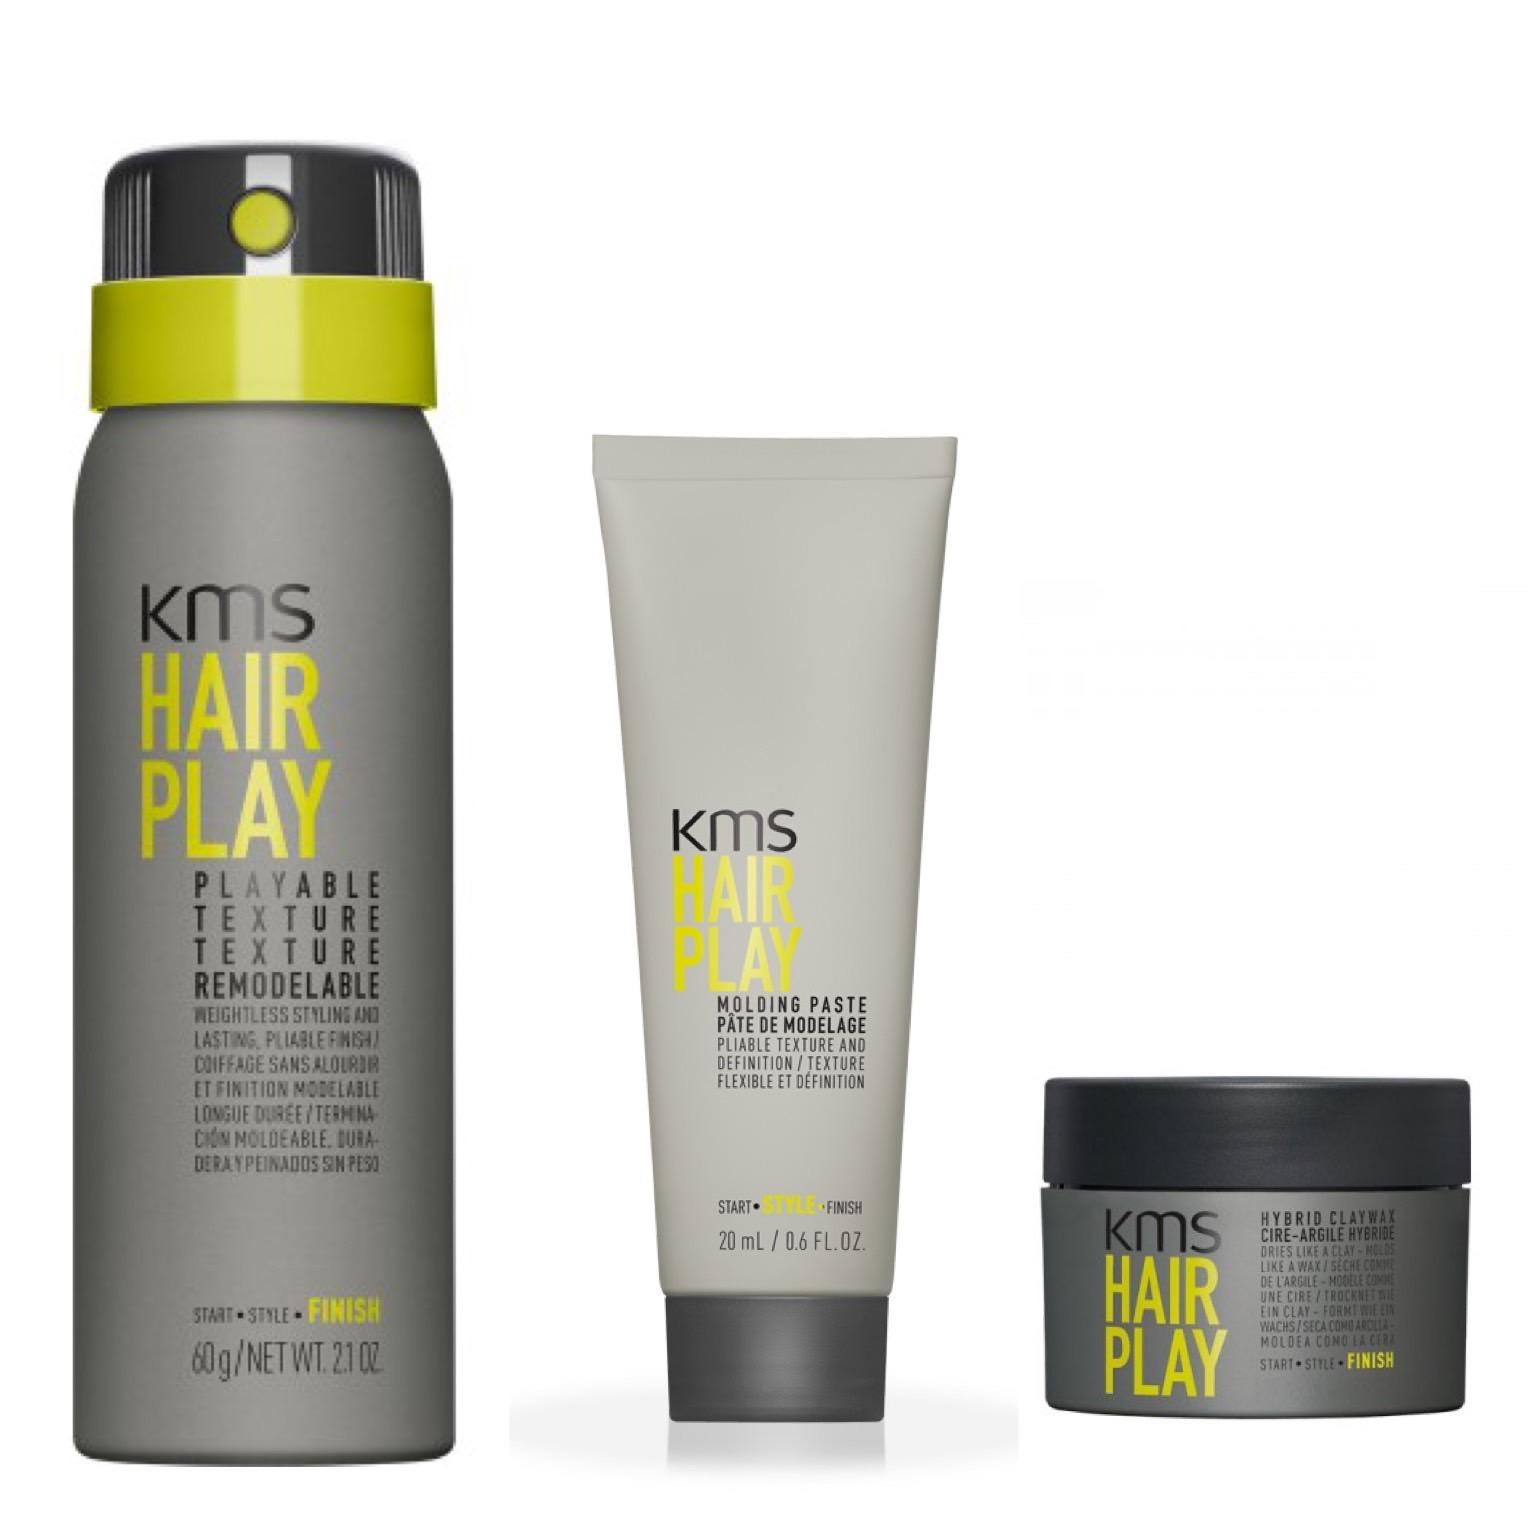 KMS California Hairplay Reisegröße Set - Playable Texture 75ml + Molding Paste 20ml + Hybrid Claywax 10ml